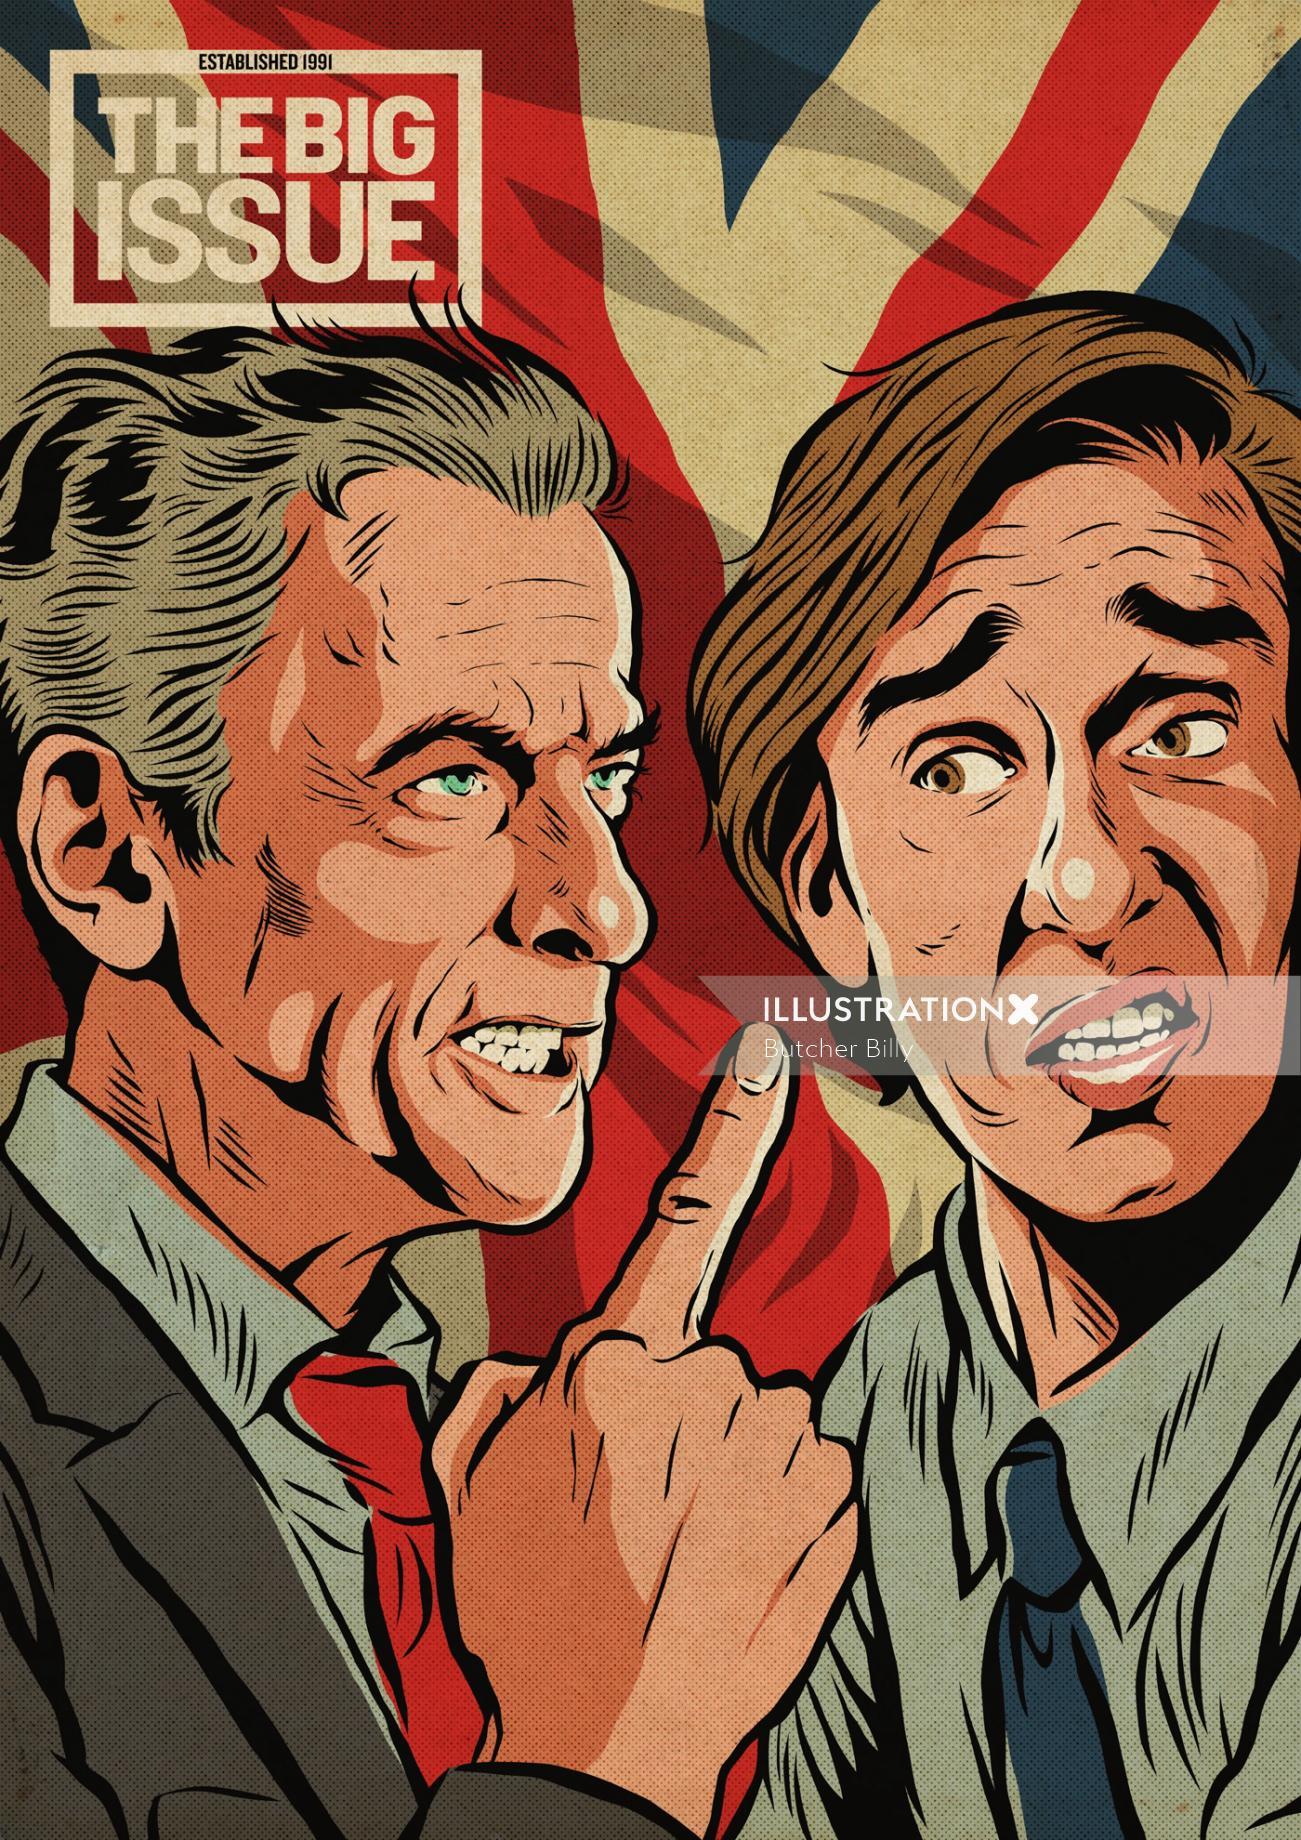 Cover illustration of peter capaldi & steve coogan